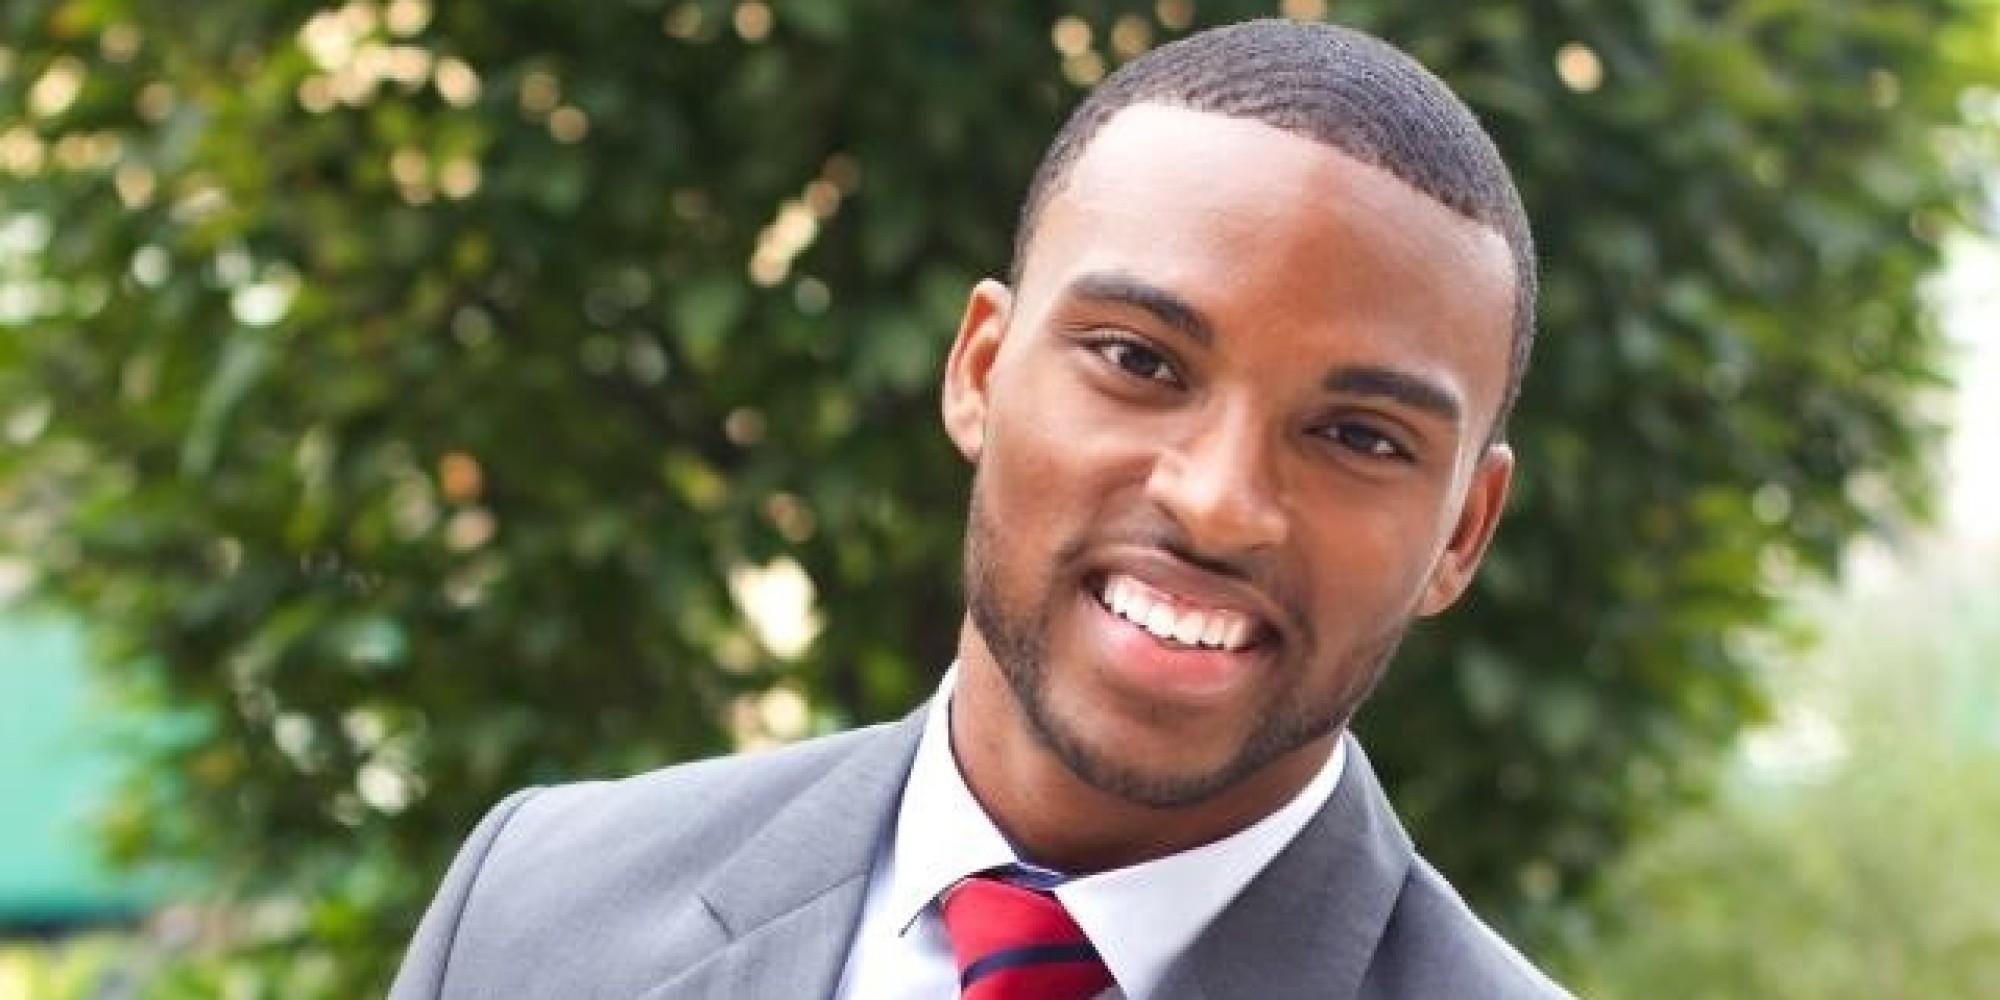 Brian Stewart Morgan State University Student Allegedly